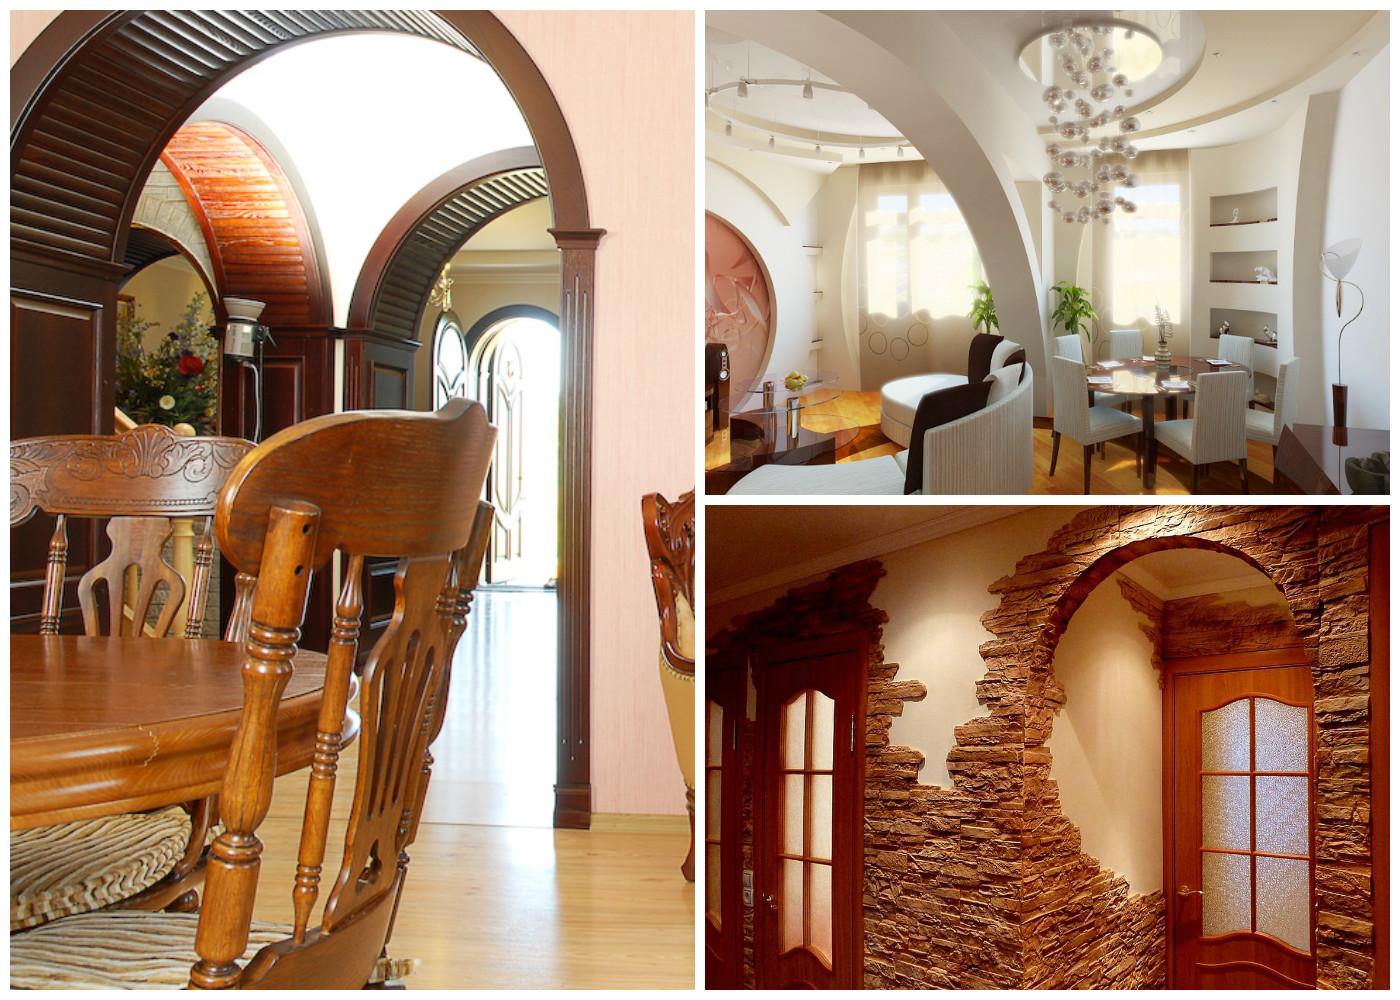 Дизайн арки варианты